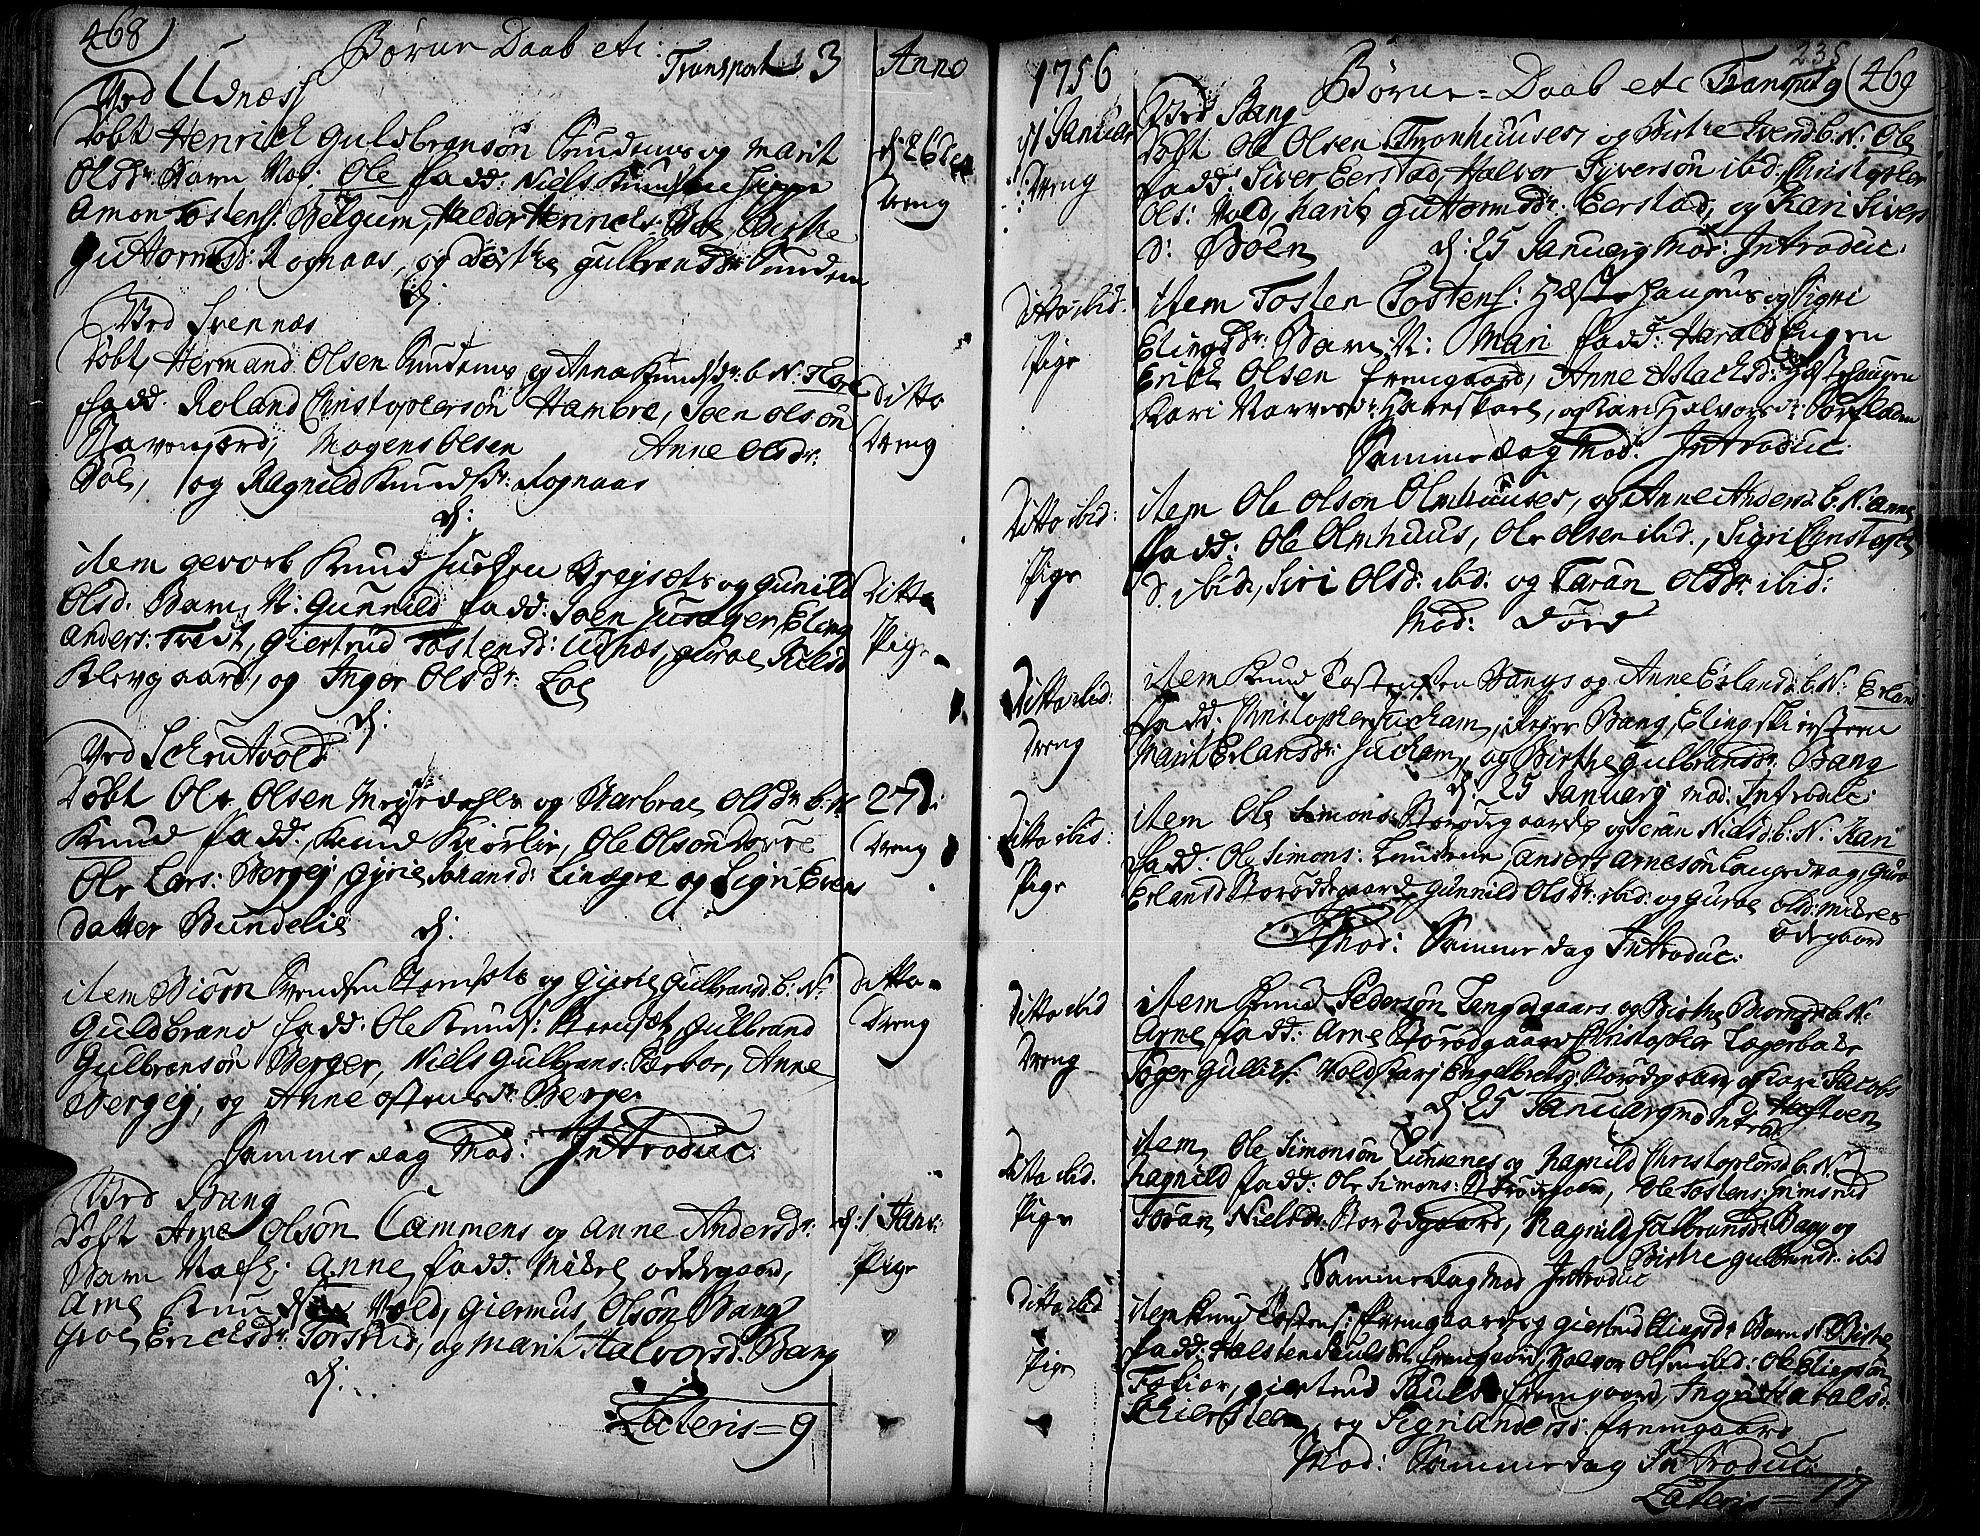 SAH, Aurdal prestekontor, Ministerialbok nr. 4, 1730-1762, s. 468-469